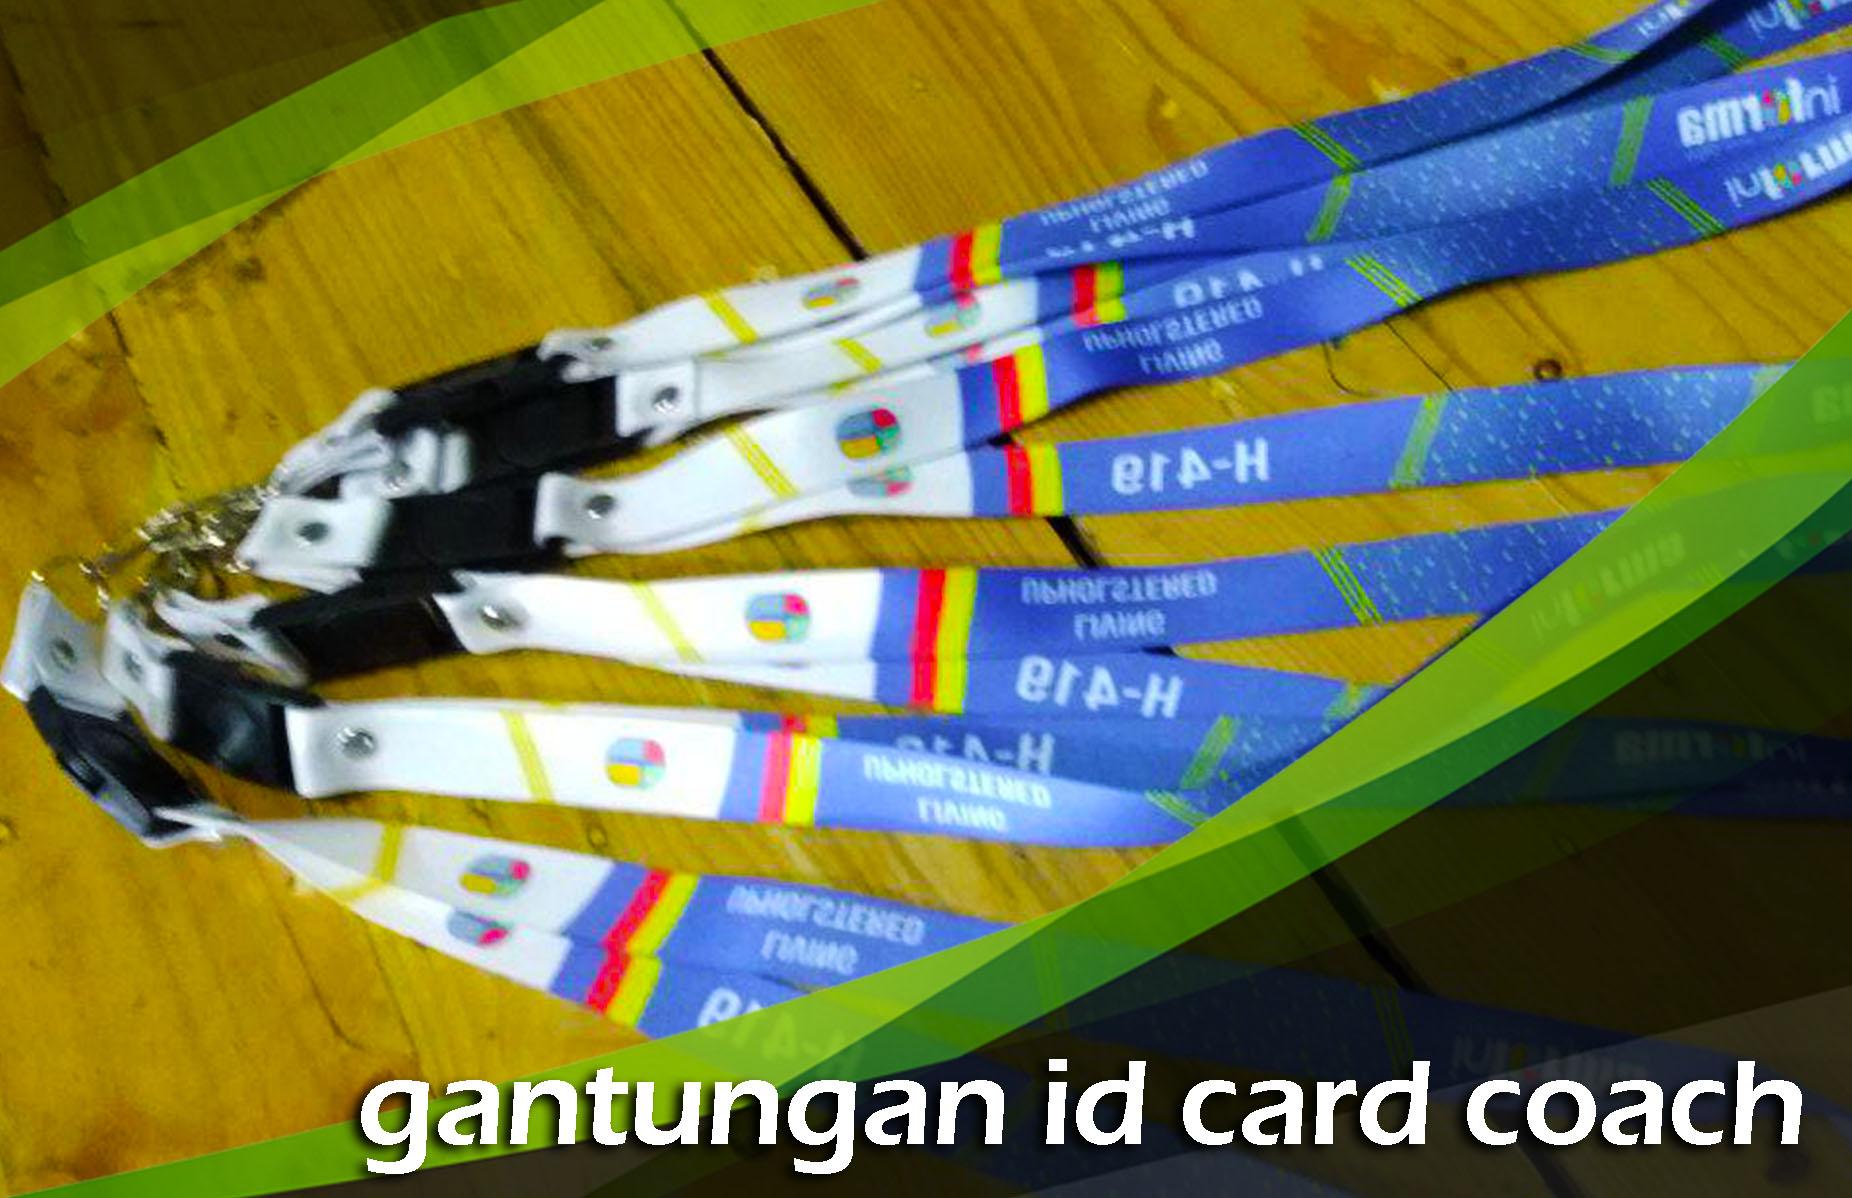 Gantungan ID Card Coach